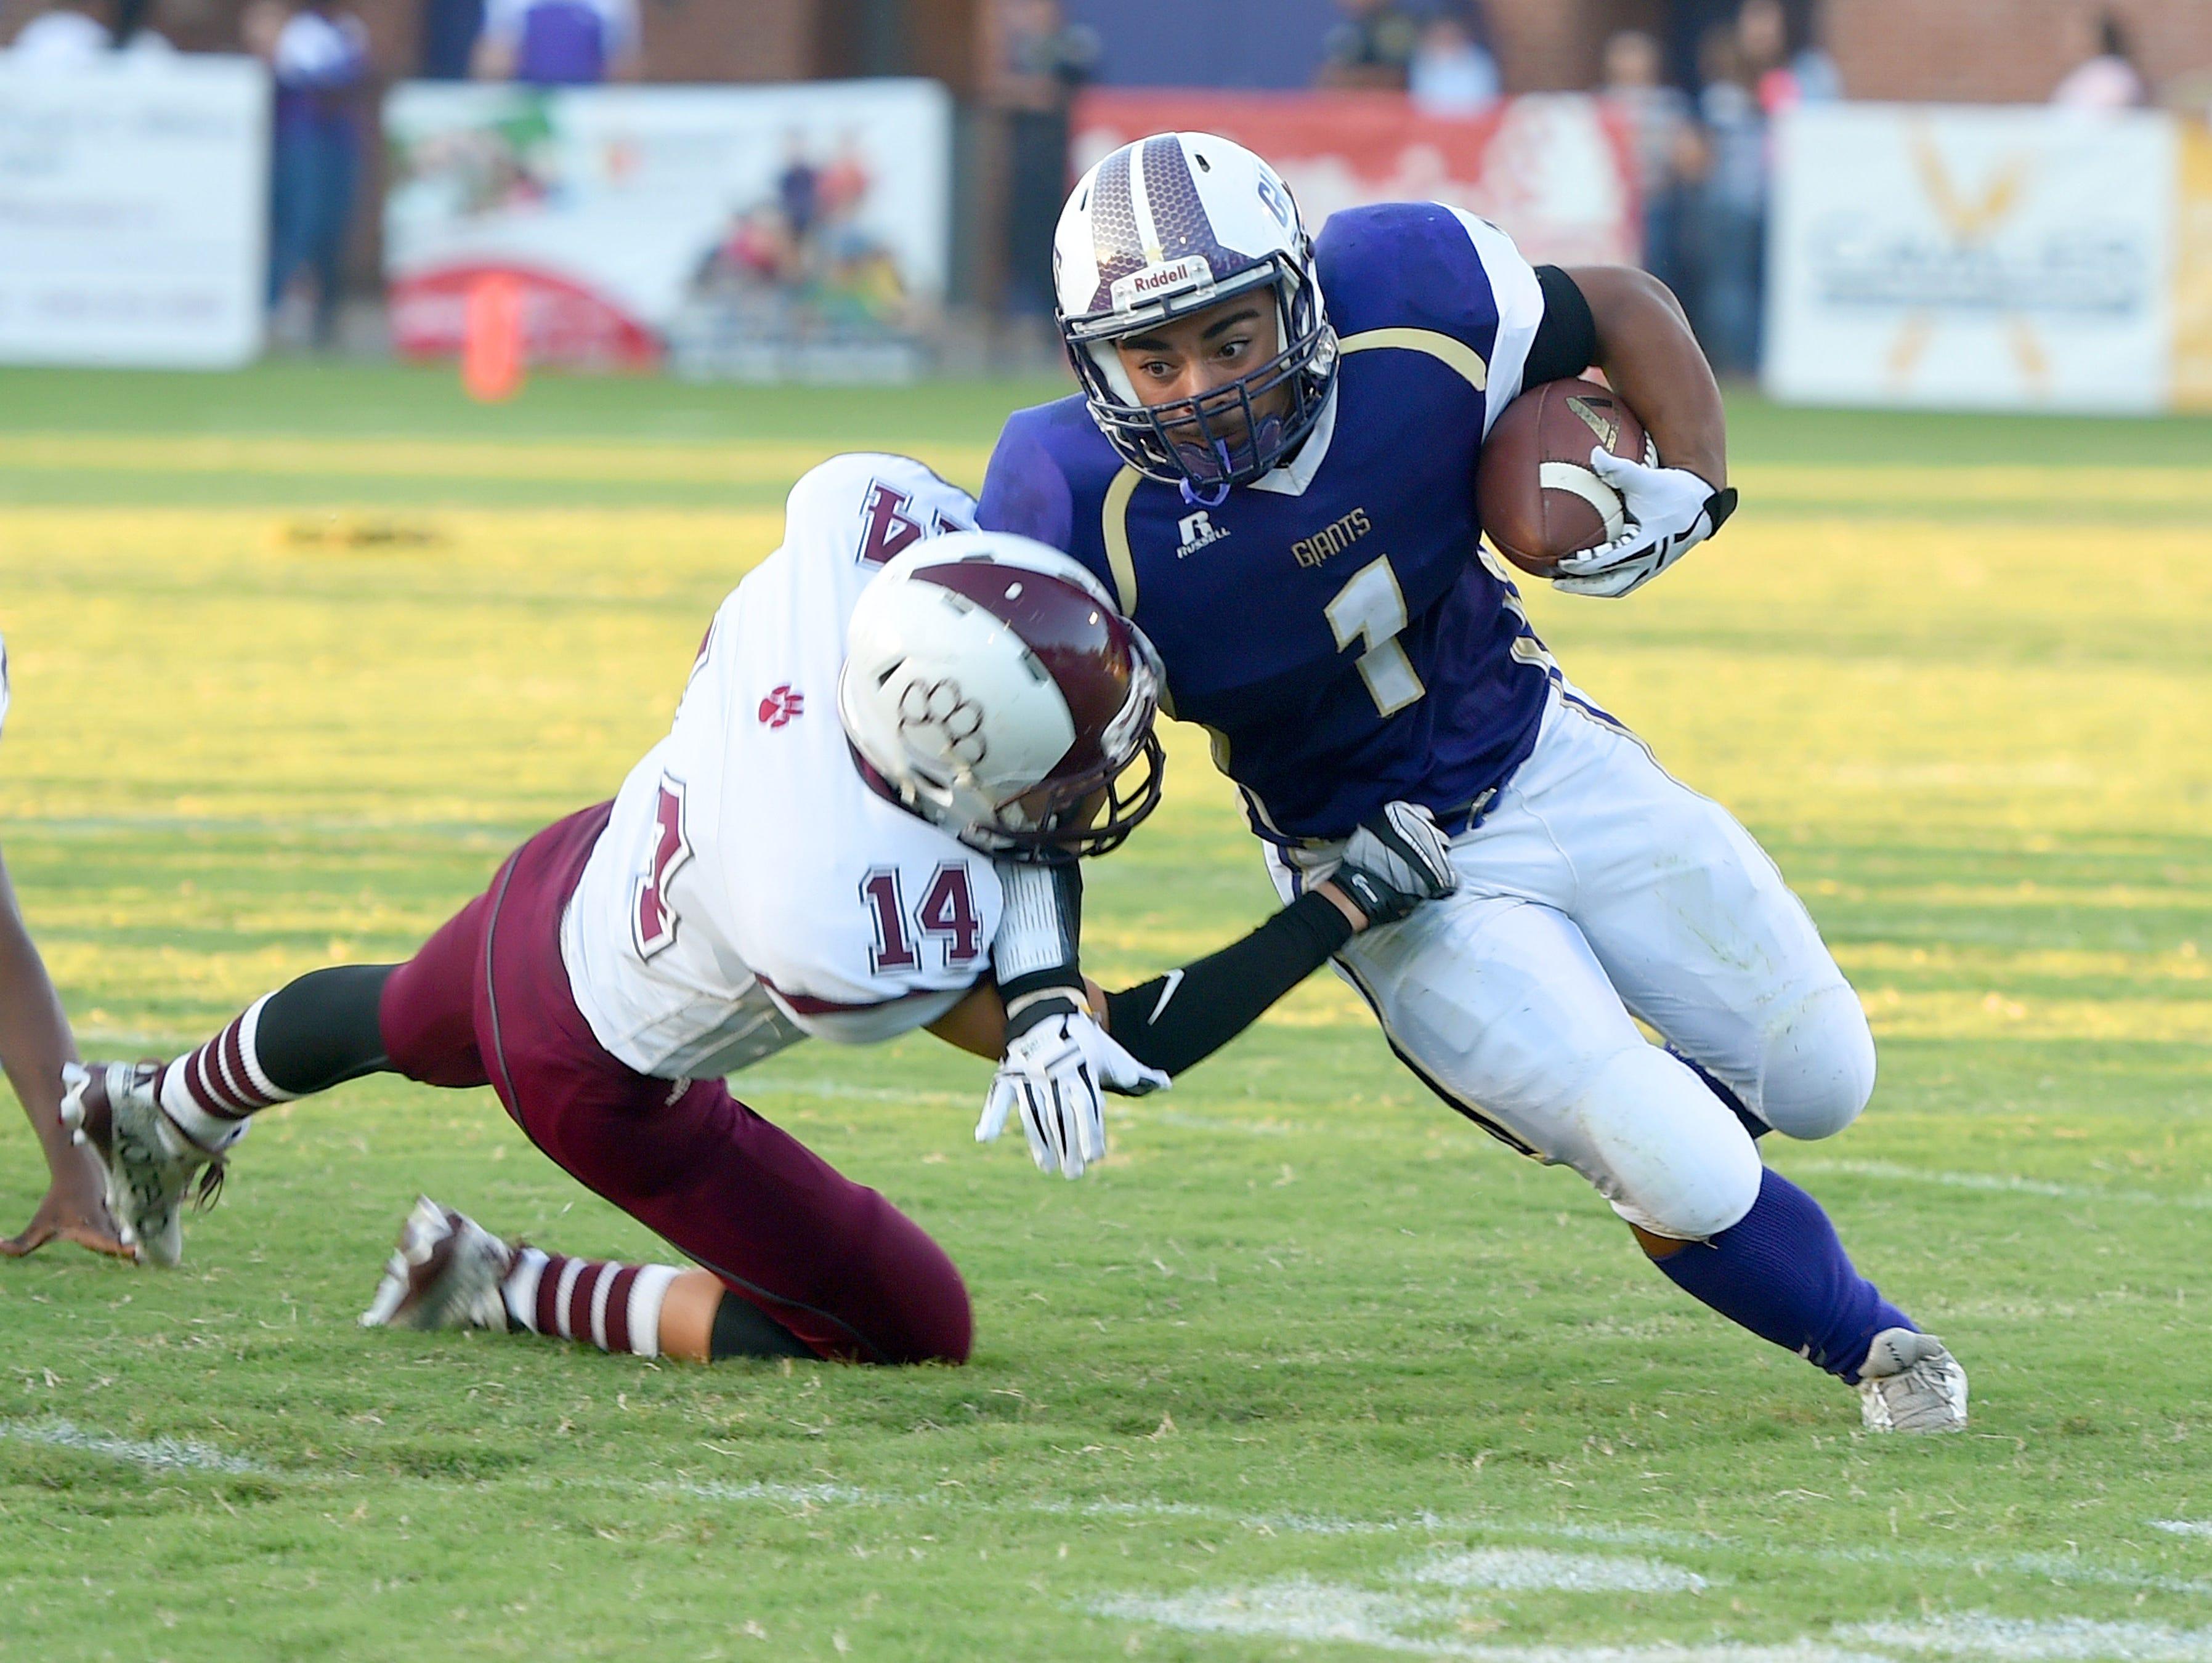 Waynesboro's Marendon Armon Jones tries to slip around Stuarts Draft's Trevor Craig who reaches for a tackle during a football game played in Waynesboro on Friday, Sept. 11, 2015.